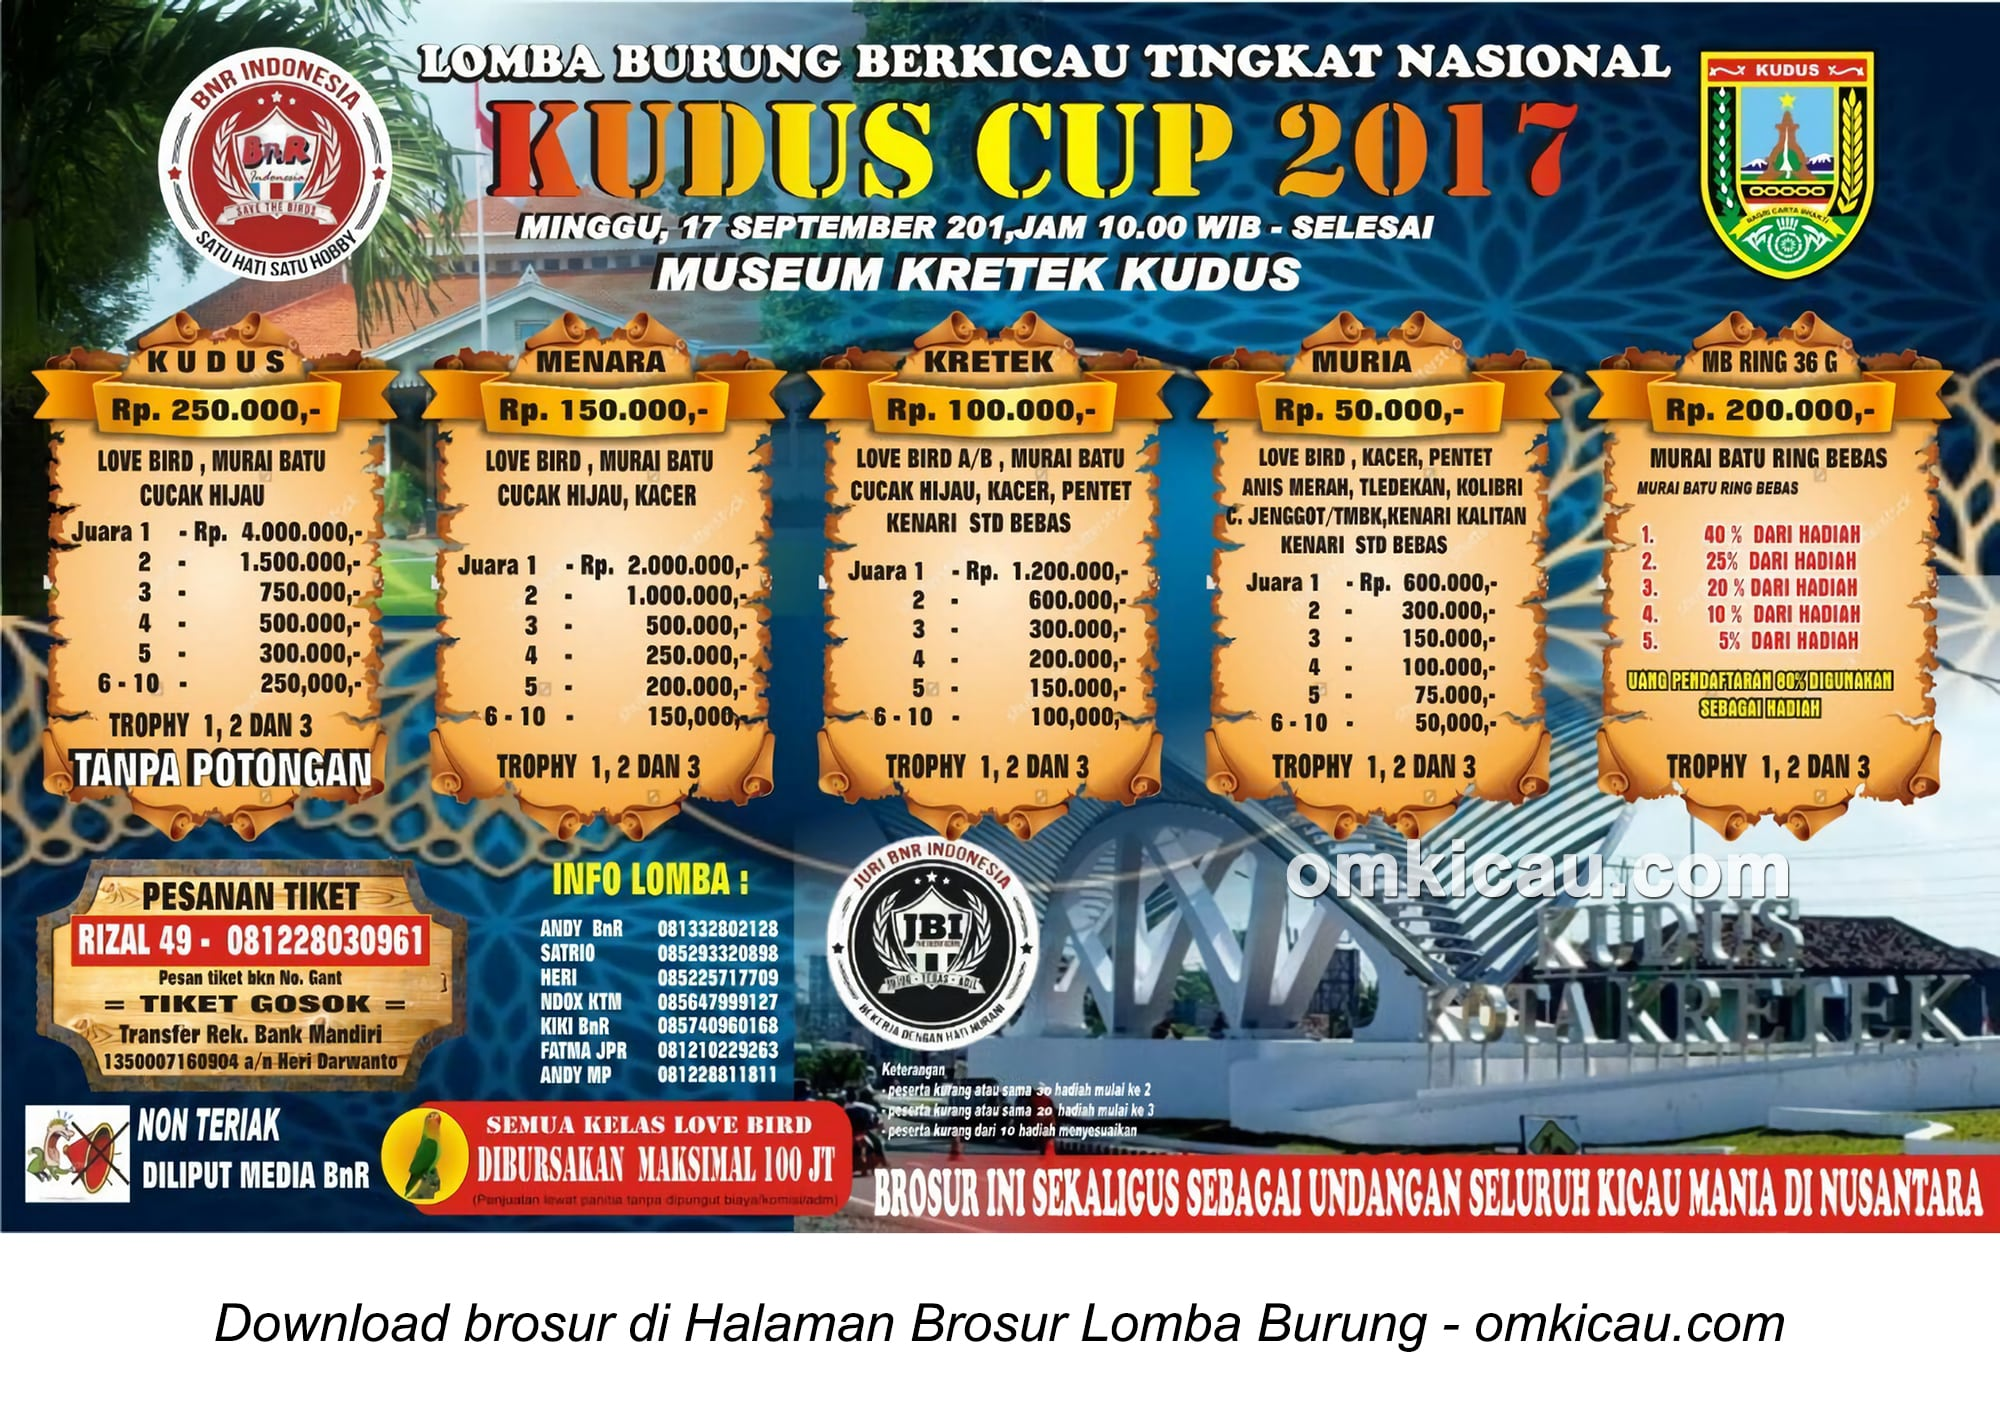 Kudus Cup 2017